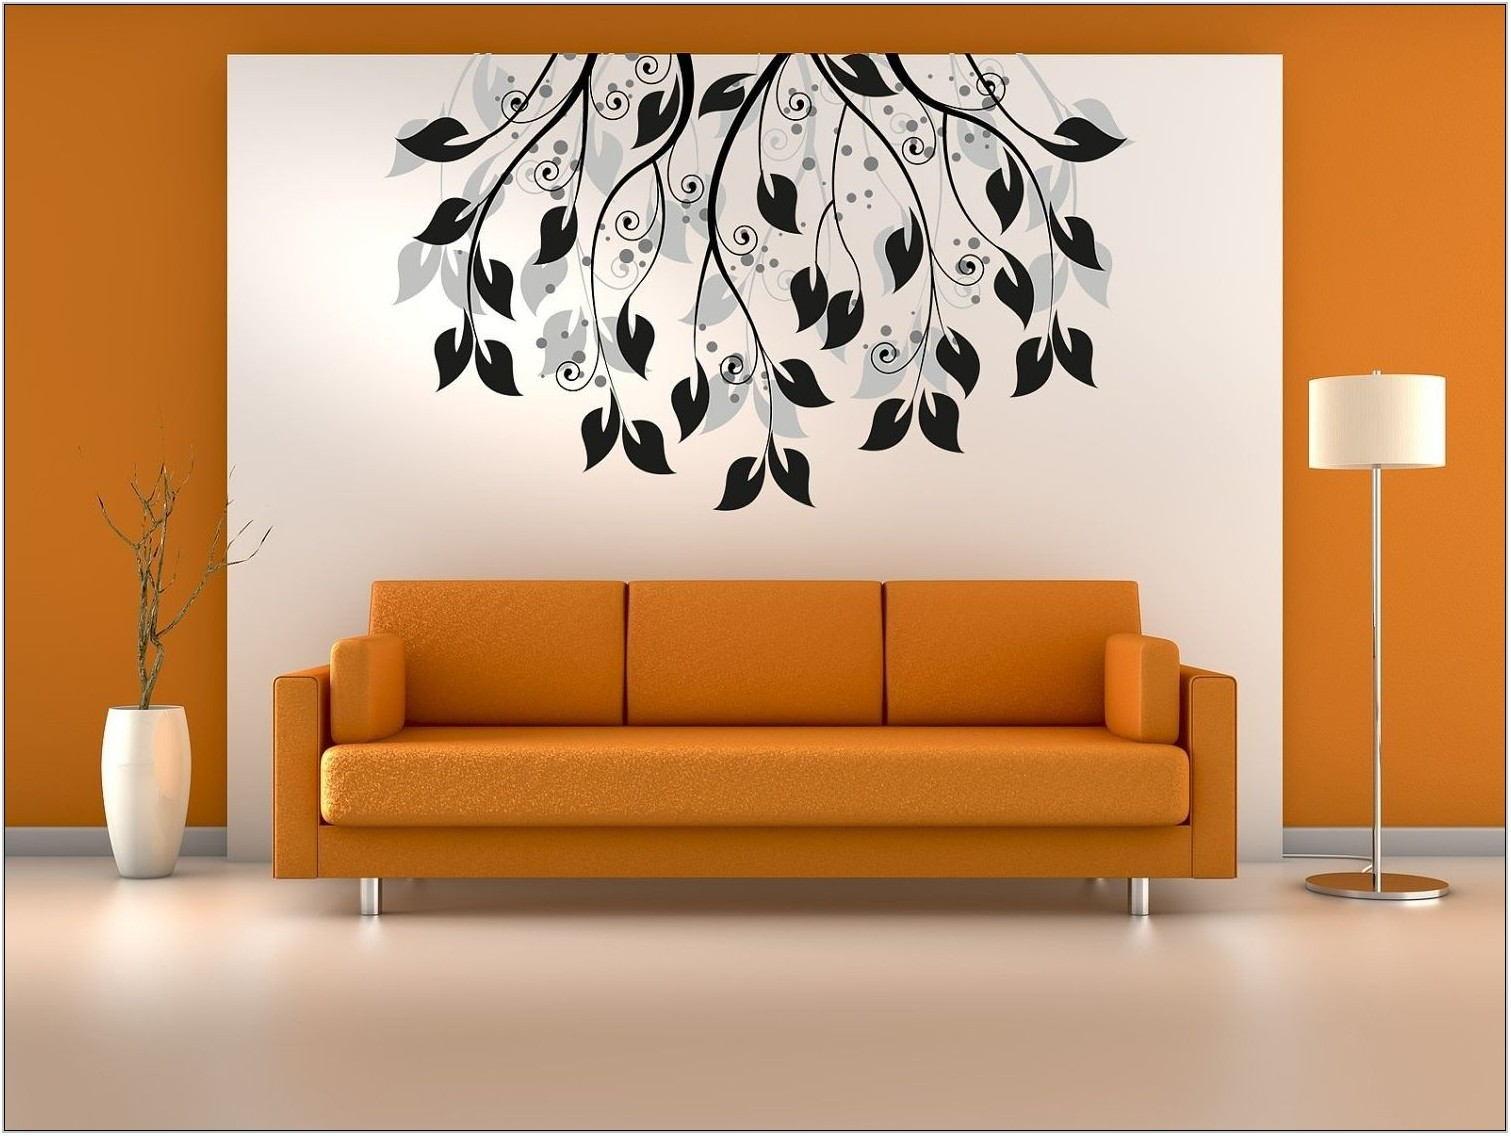 Wall Art Designs For Living Room